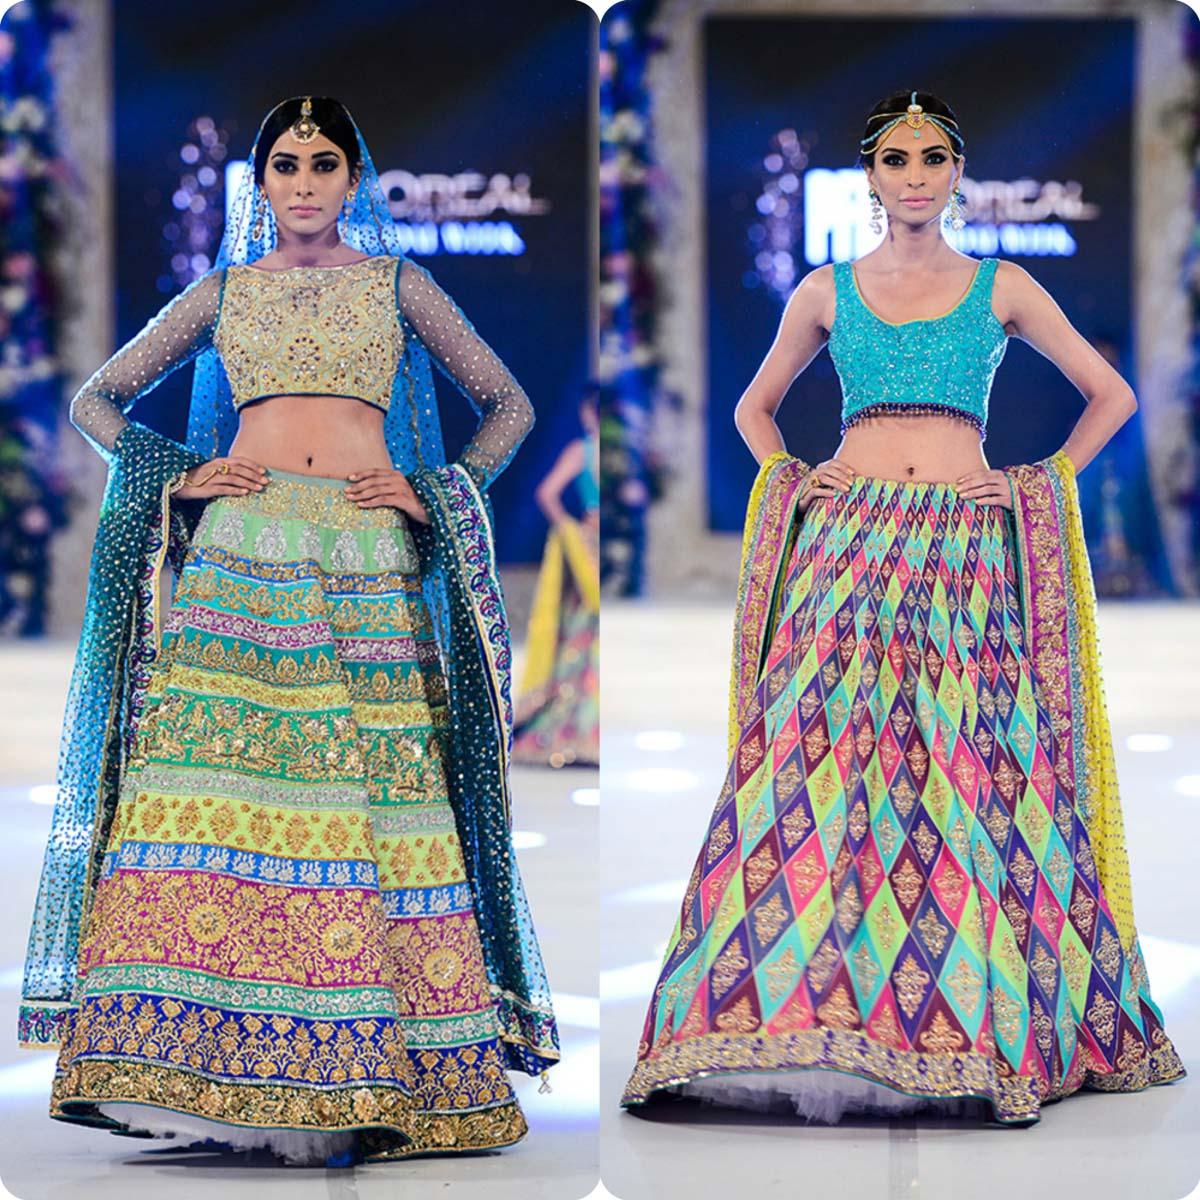 Nomi Ansari Bridal Wear Collection Ft-Junaid Khan & Maya Ali 2016-17 (7)